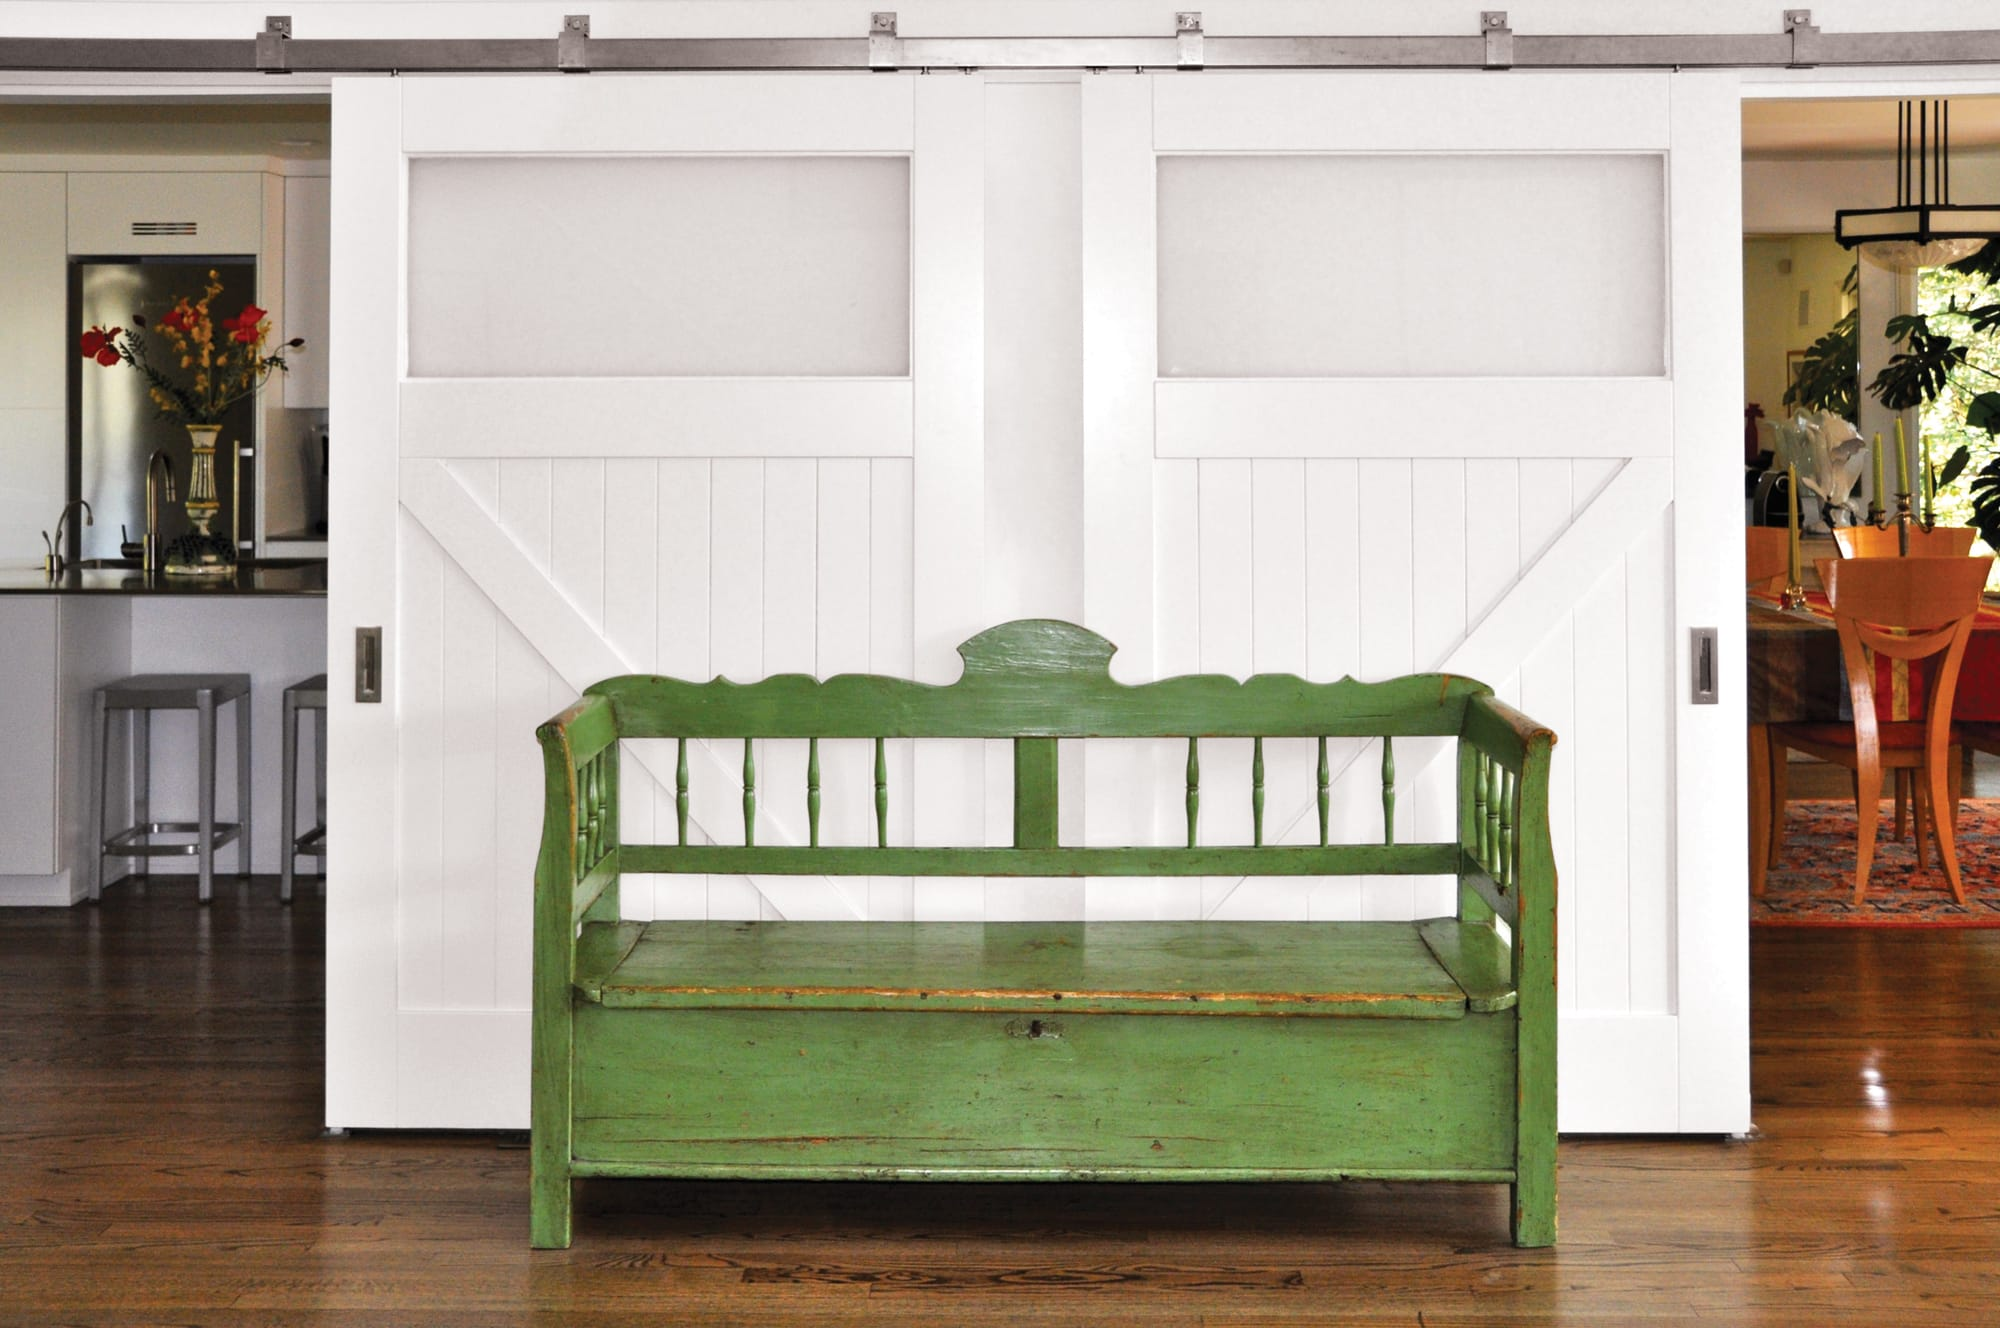 11. Interior Sliding Barn Doors (Classic Z Brace) in Virginia Beach, VA